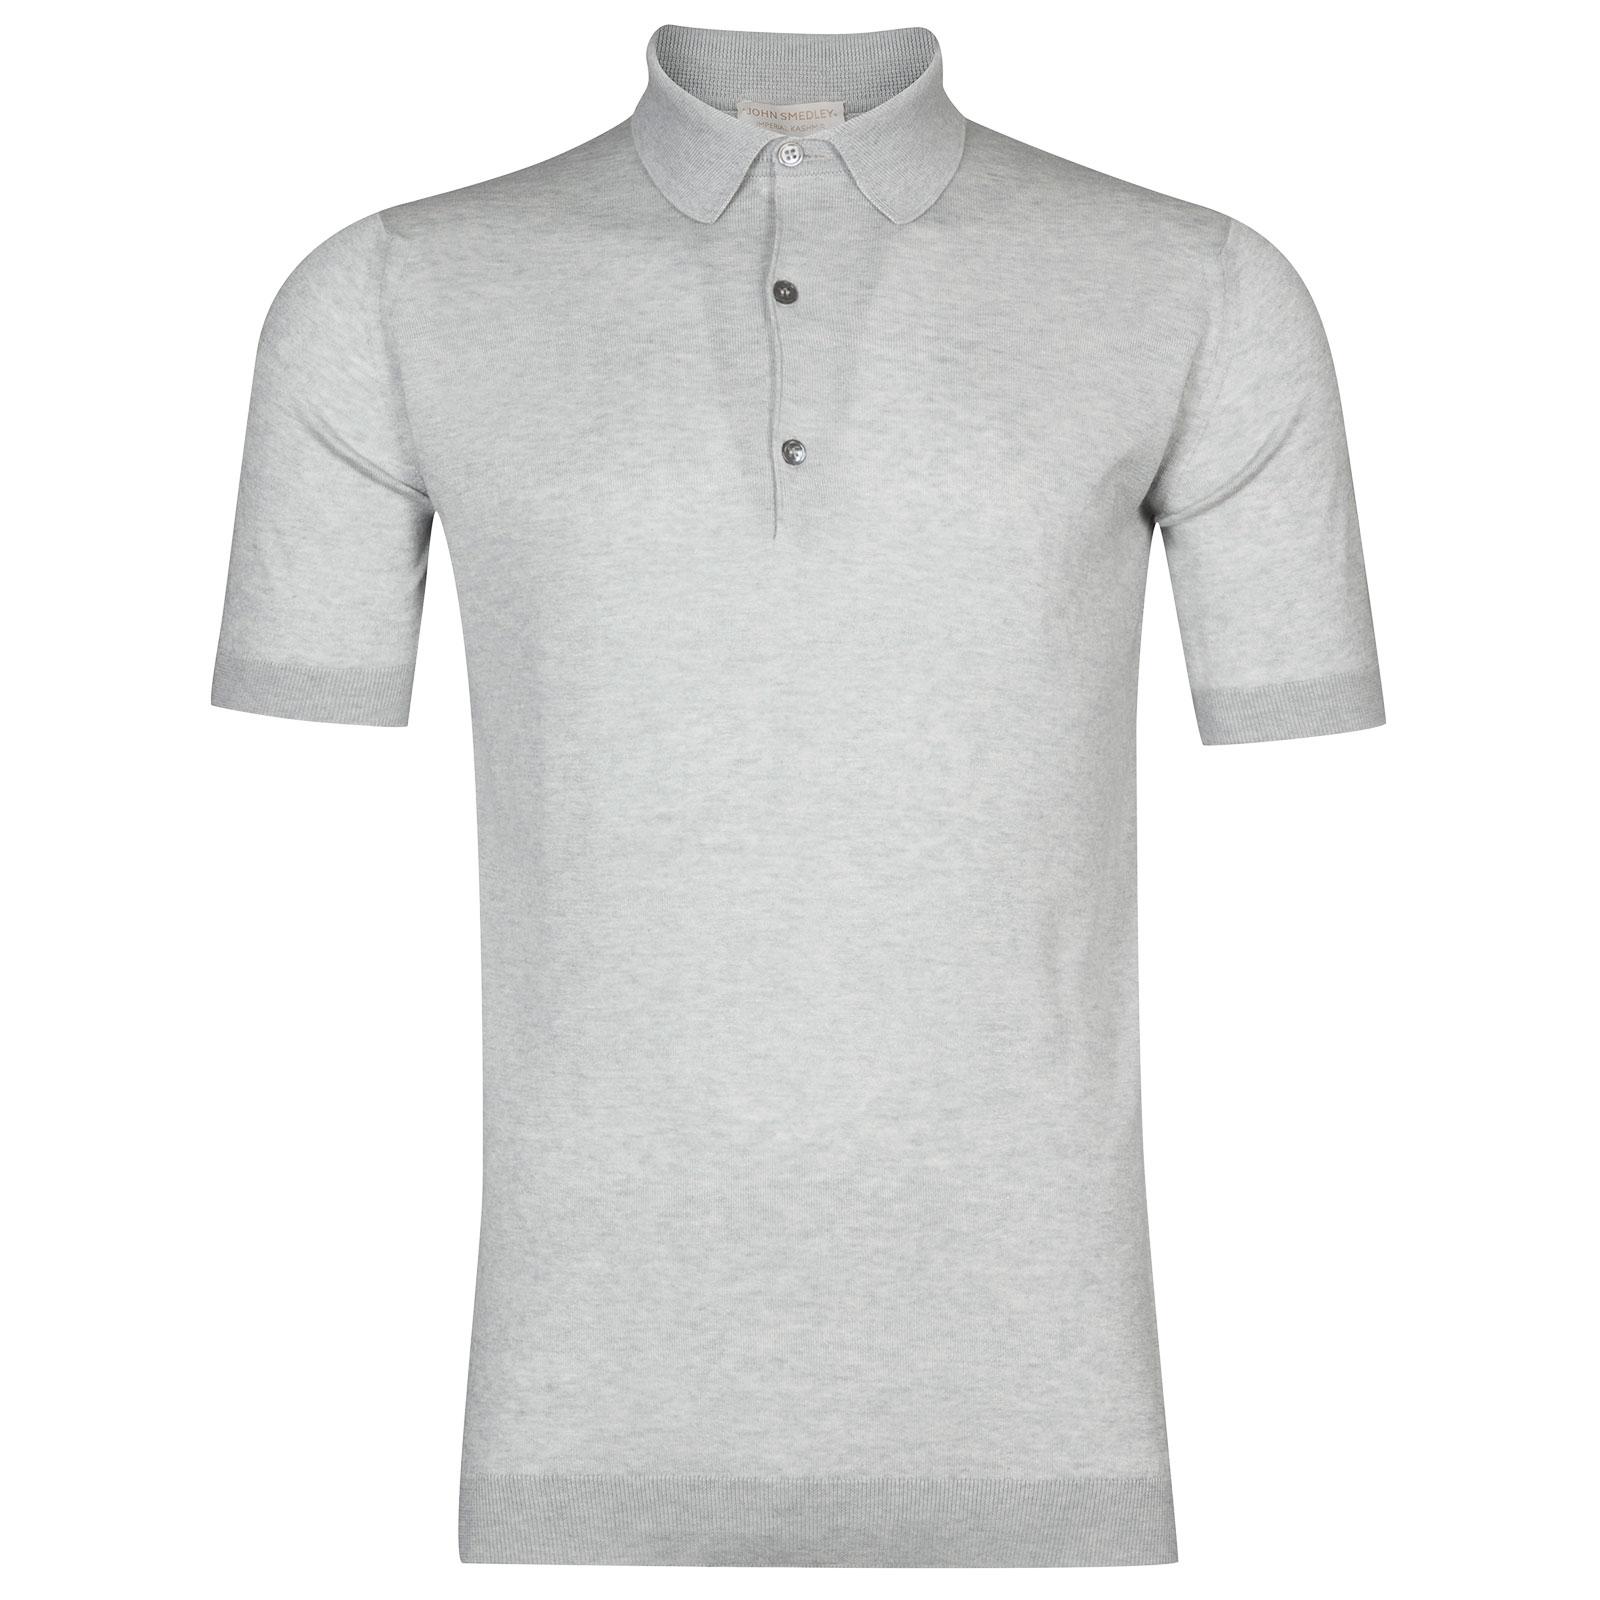 John Smedley Haddon in Silver Shirt-MED